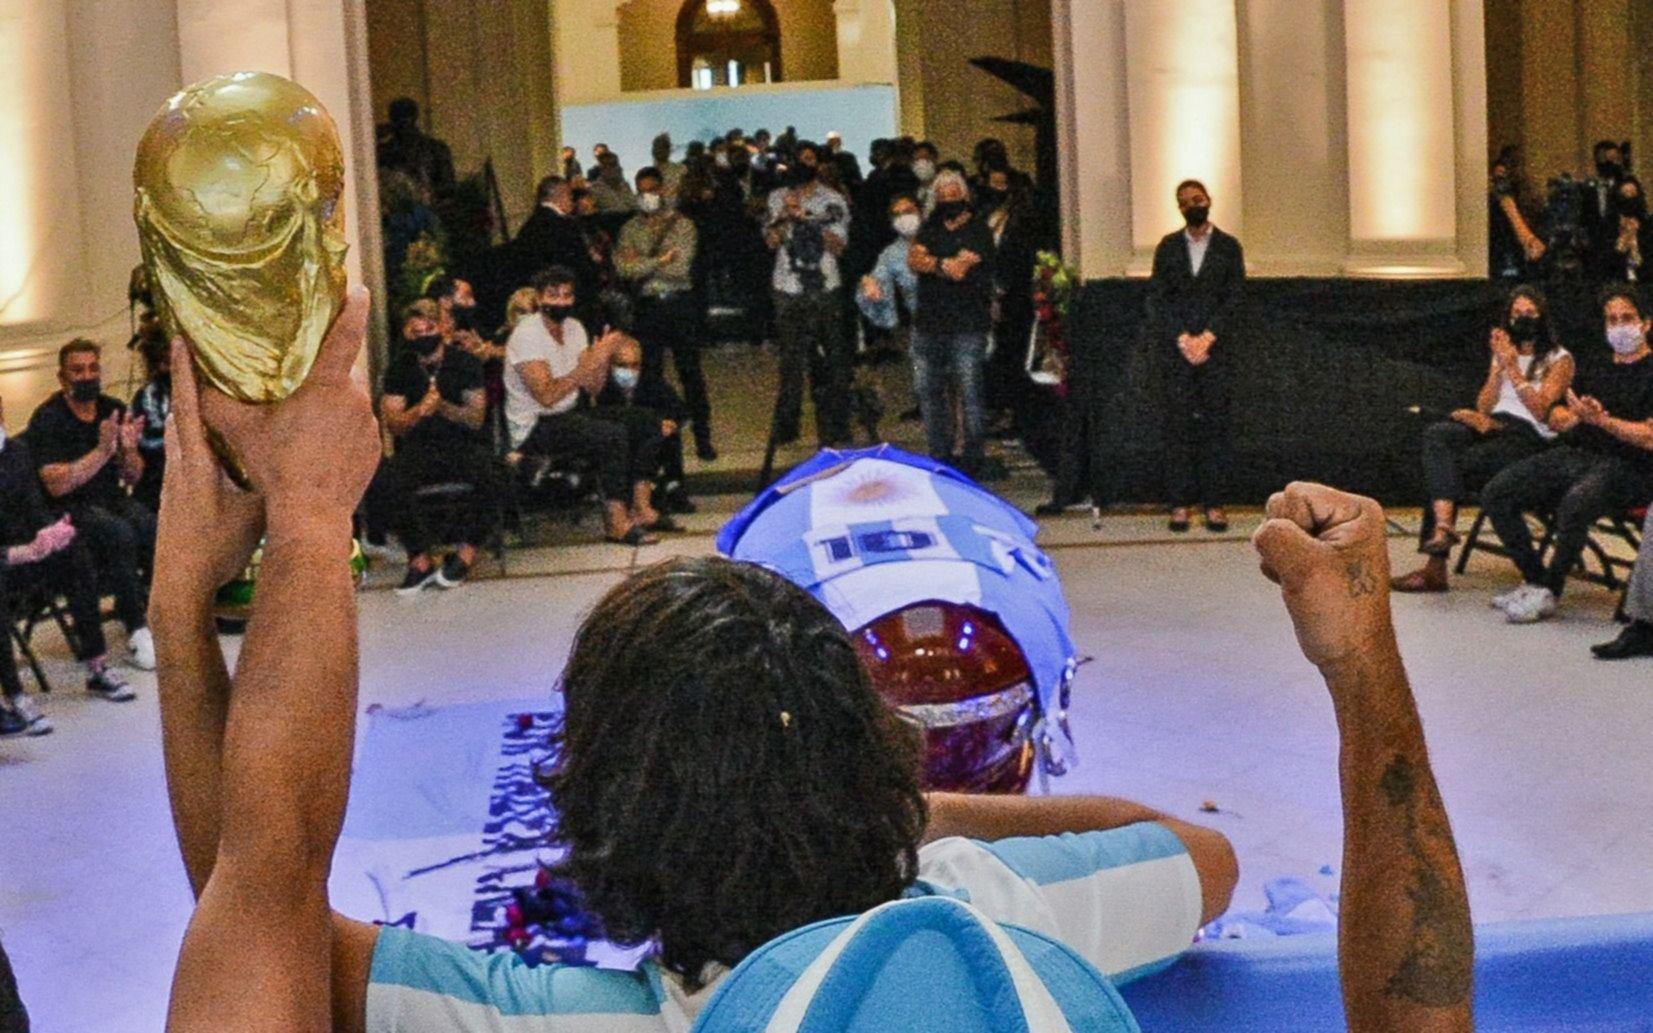 Matías Morla explotó por la repudiable foto viral de Maradona dentro del ataúd